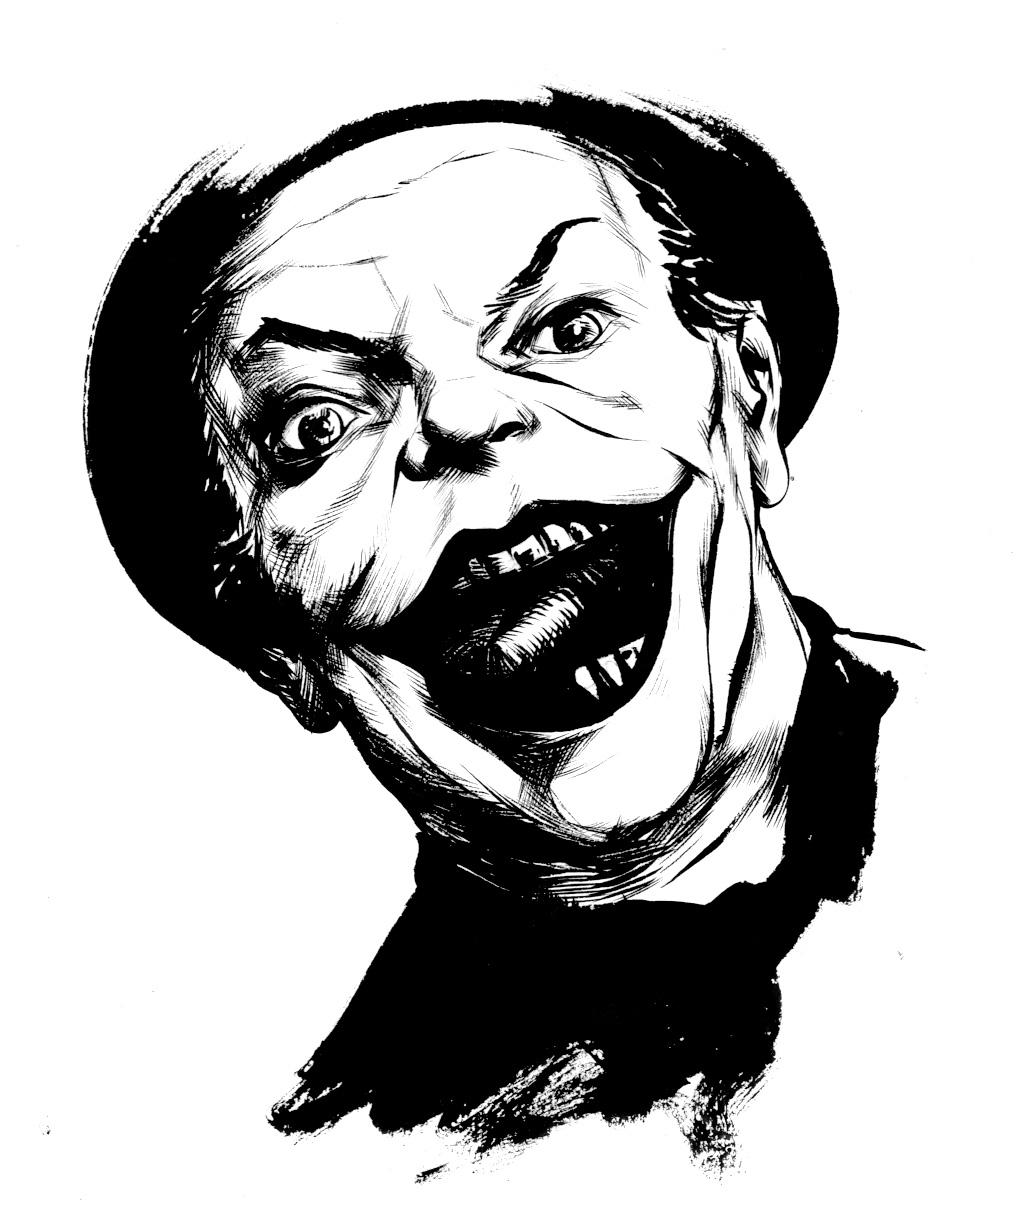 http://1.bp.blogspot.com/-EL54QldsZt8/T2om9QP6vmI/AAAAAAAAA0k/1THkj8wLcP0/s1600/Joker.jpg